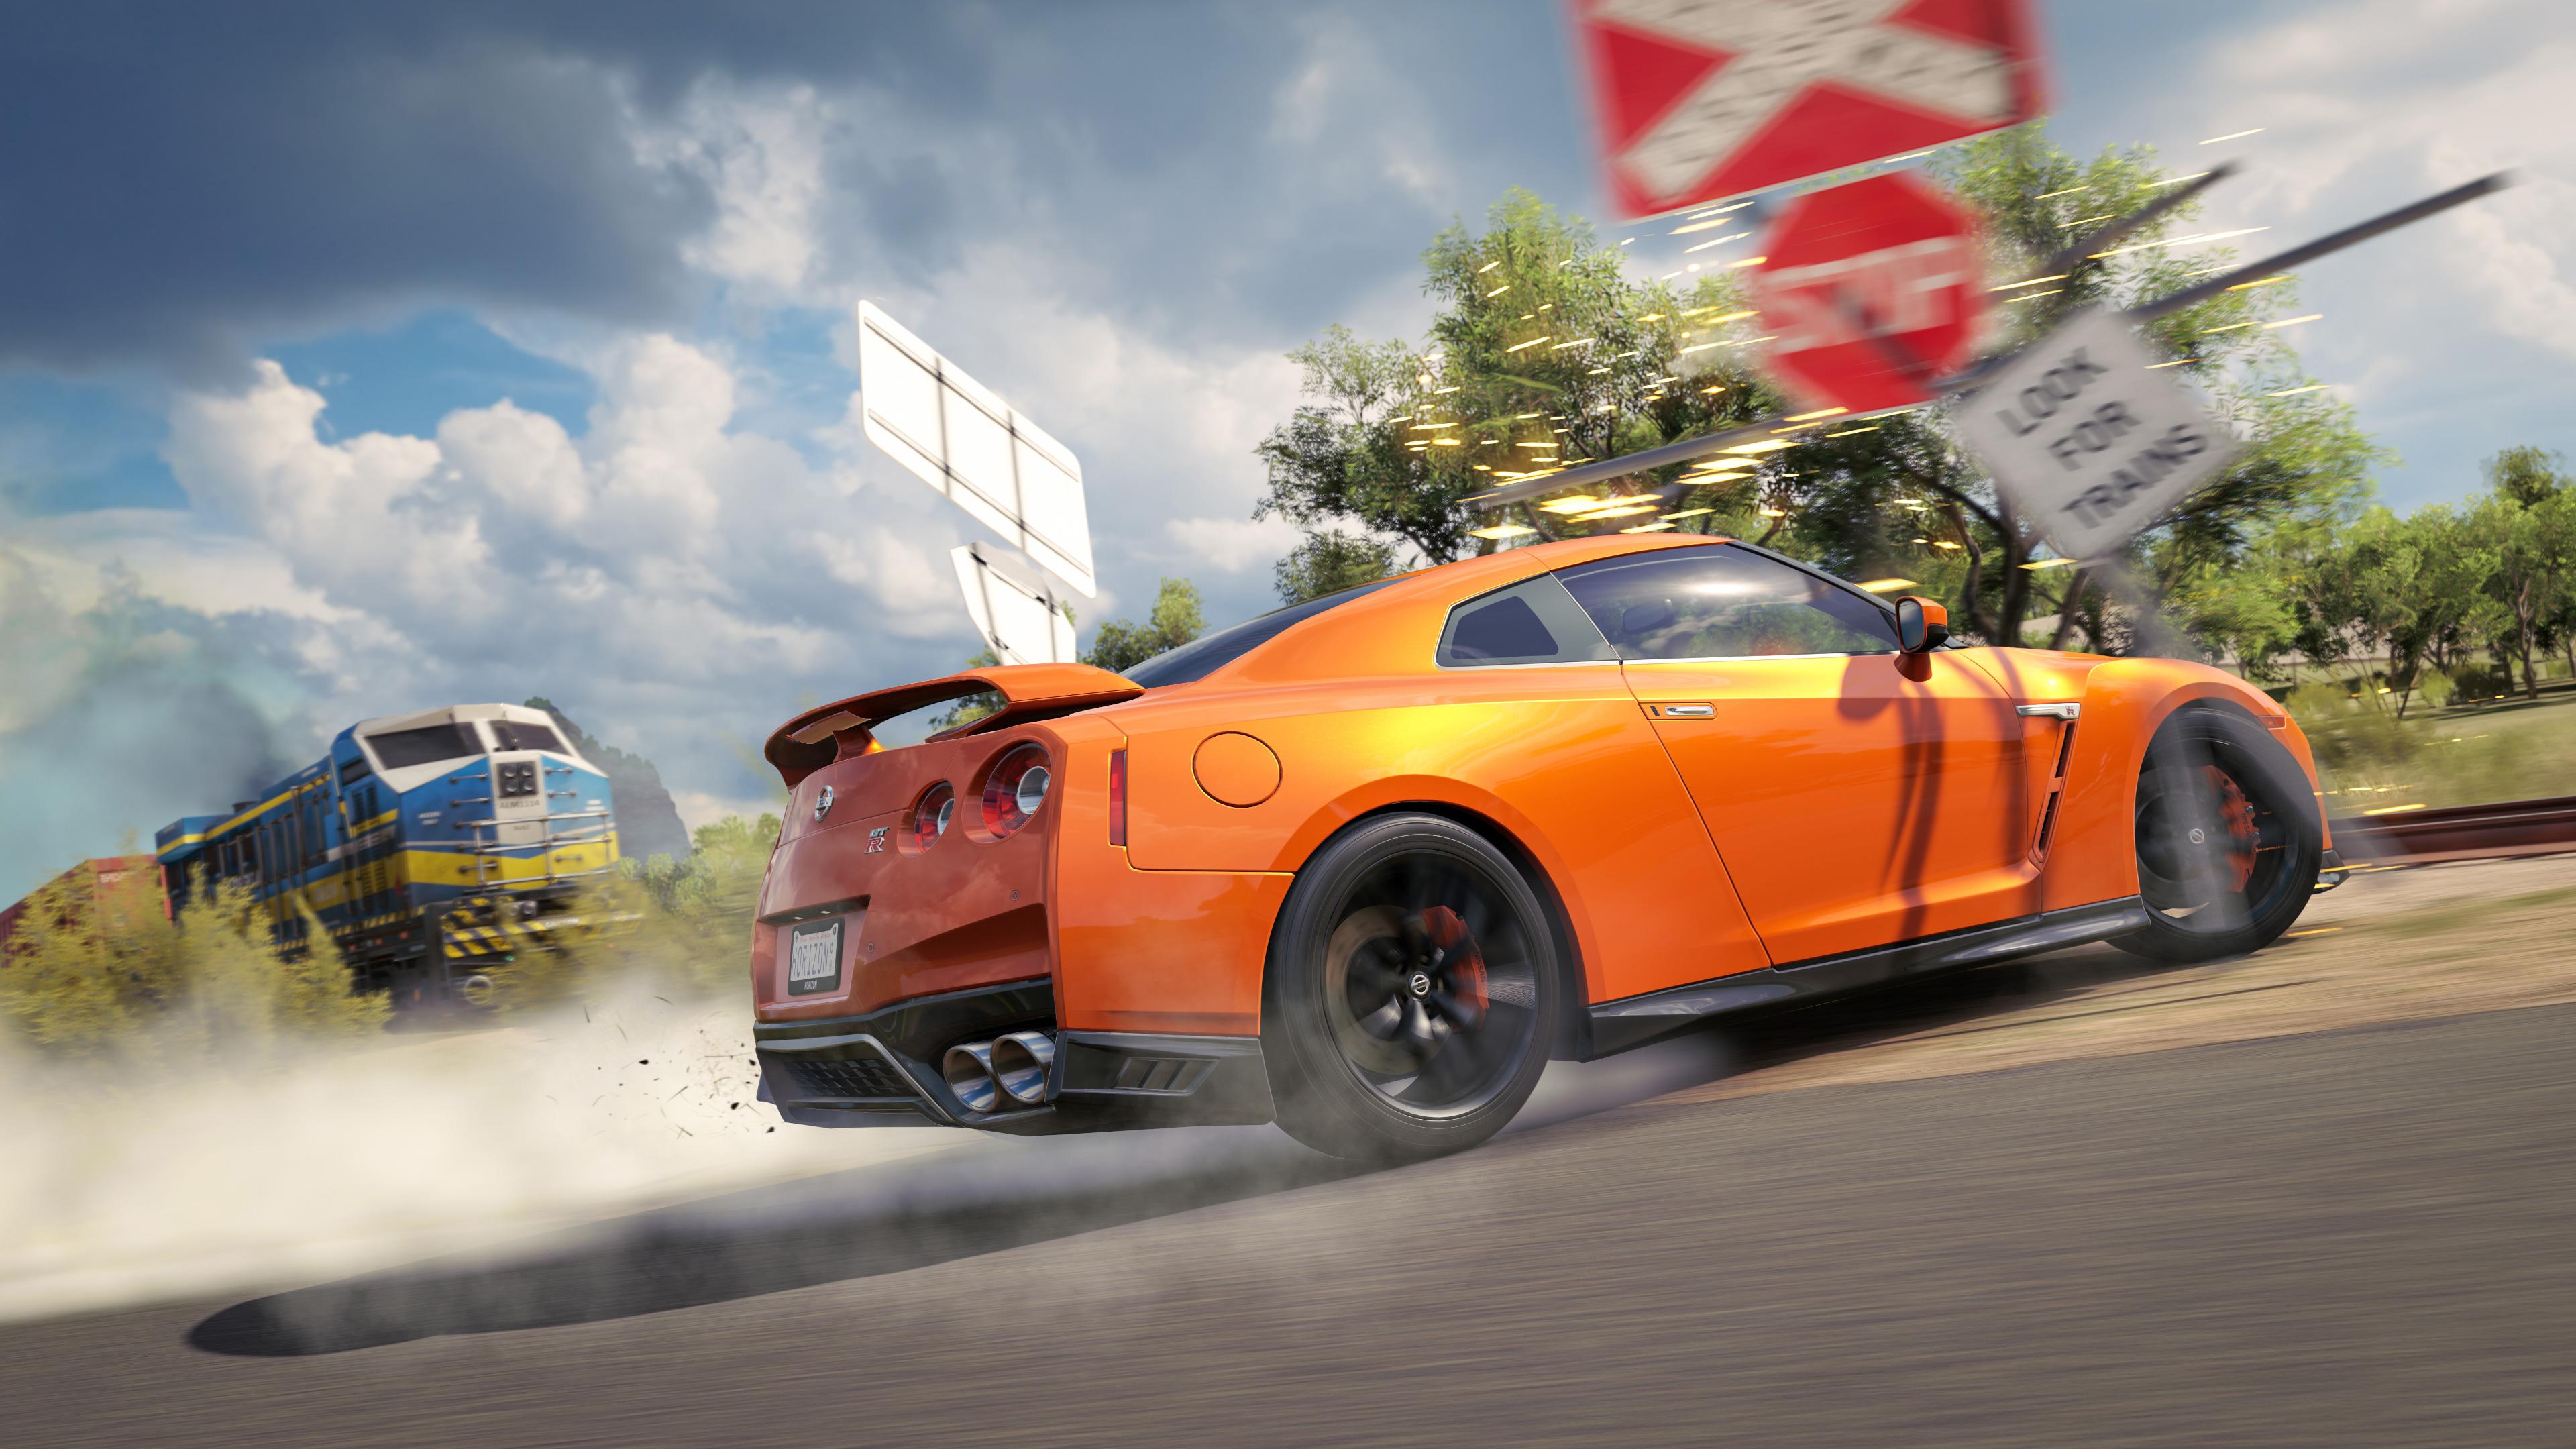 640x960 Forza Horizon 3 Nissan Gtr Drift 4k Iphone 4 Iphone 4s Hd